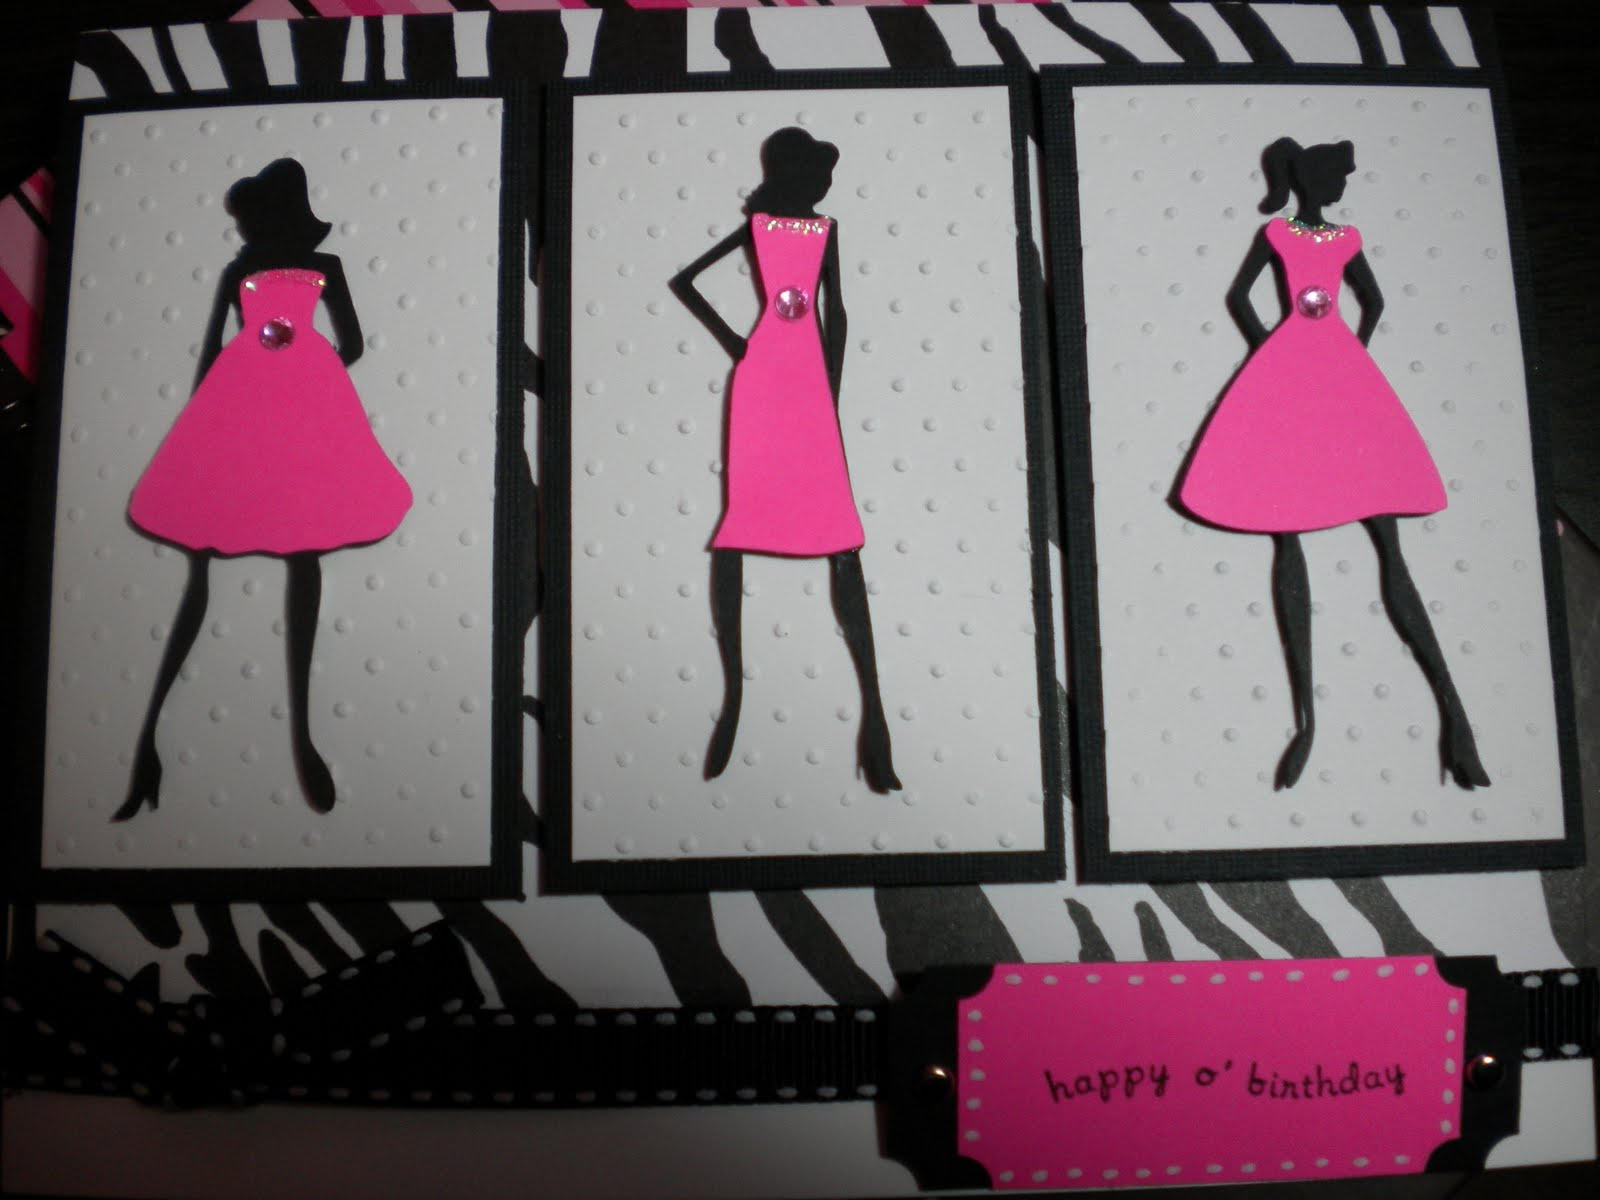 http://1.bp.blogspot.com/_X6wtVdwglE4/TIU9NHJtmPI/AAAAAAAAAFQ/bbUedamk2eI/s1600/riley,cards,%2Band%2Bstamps%2B035.JPG